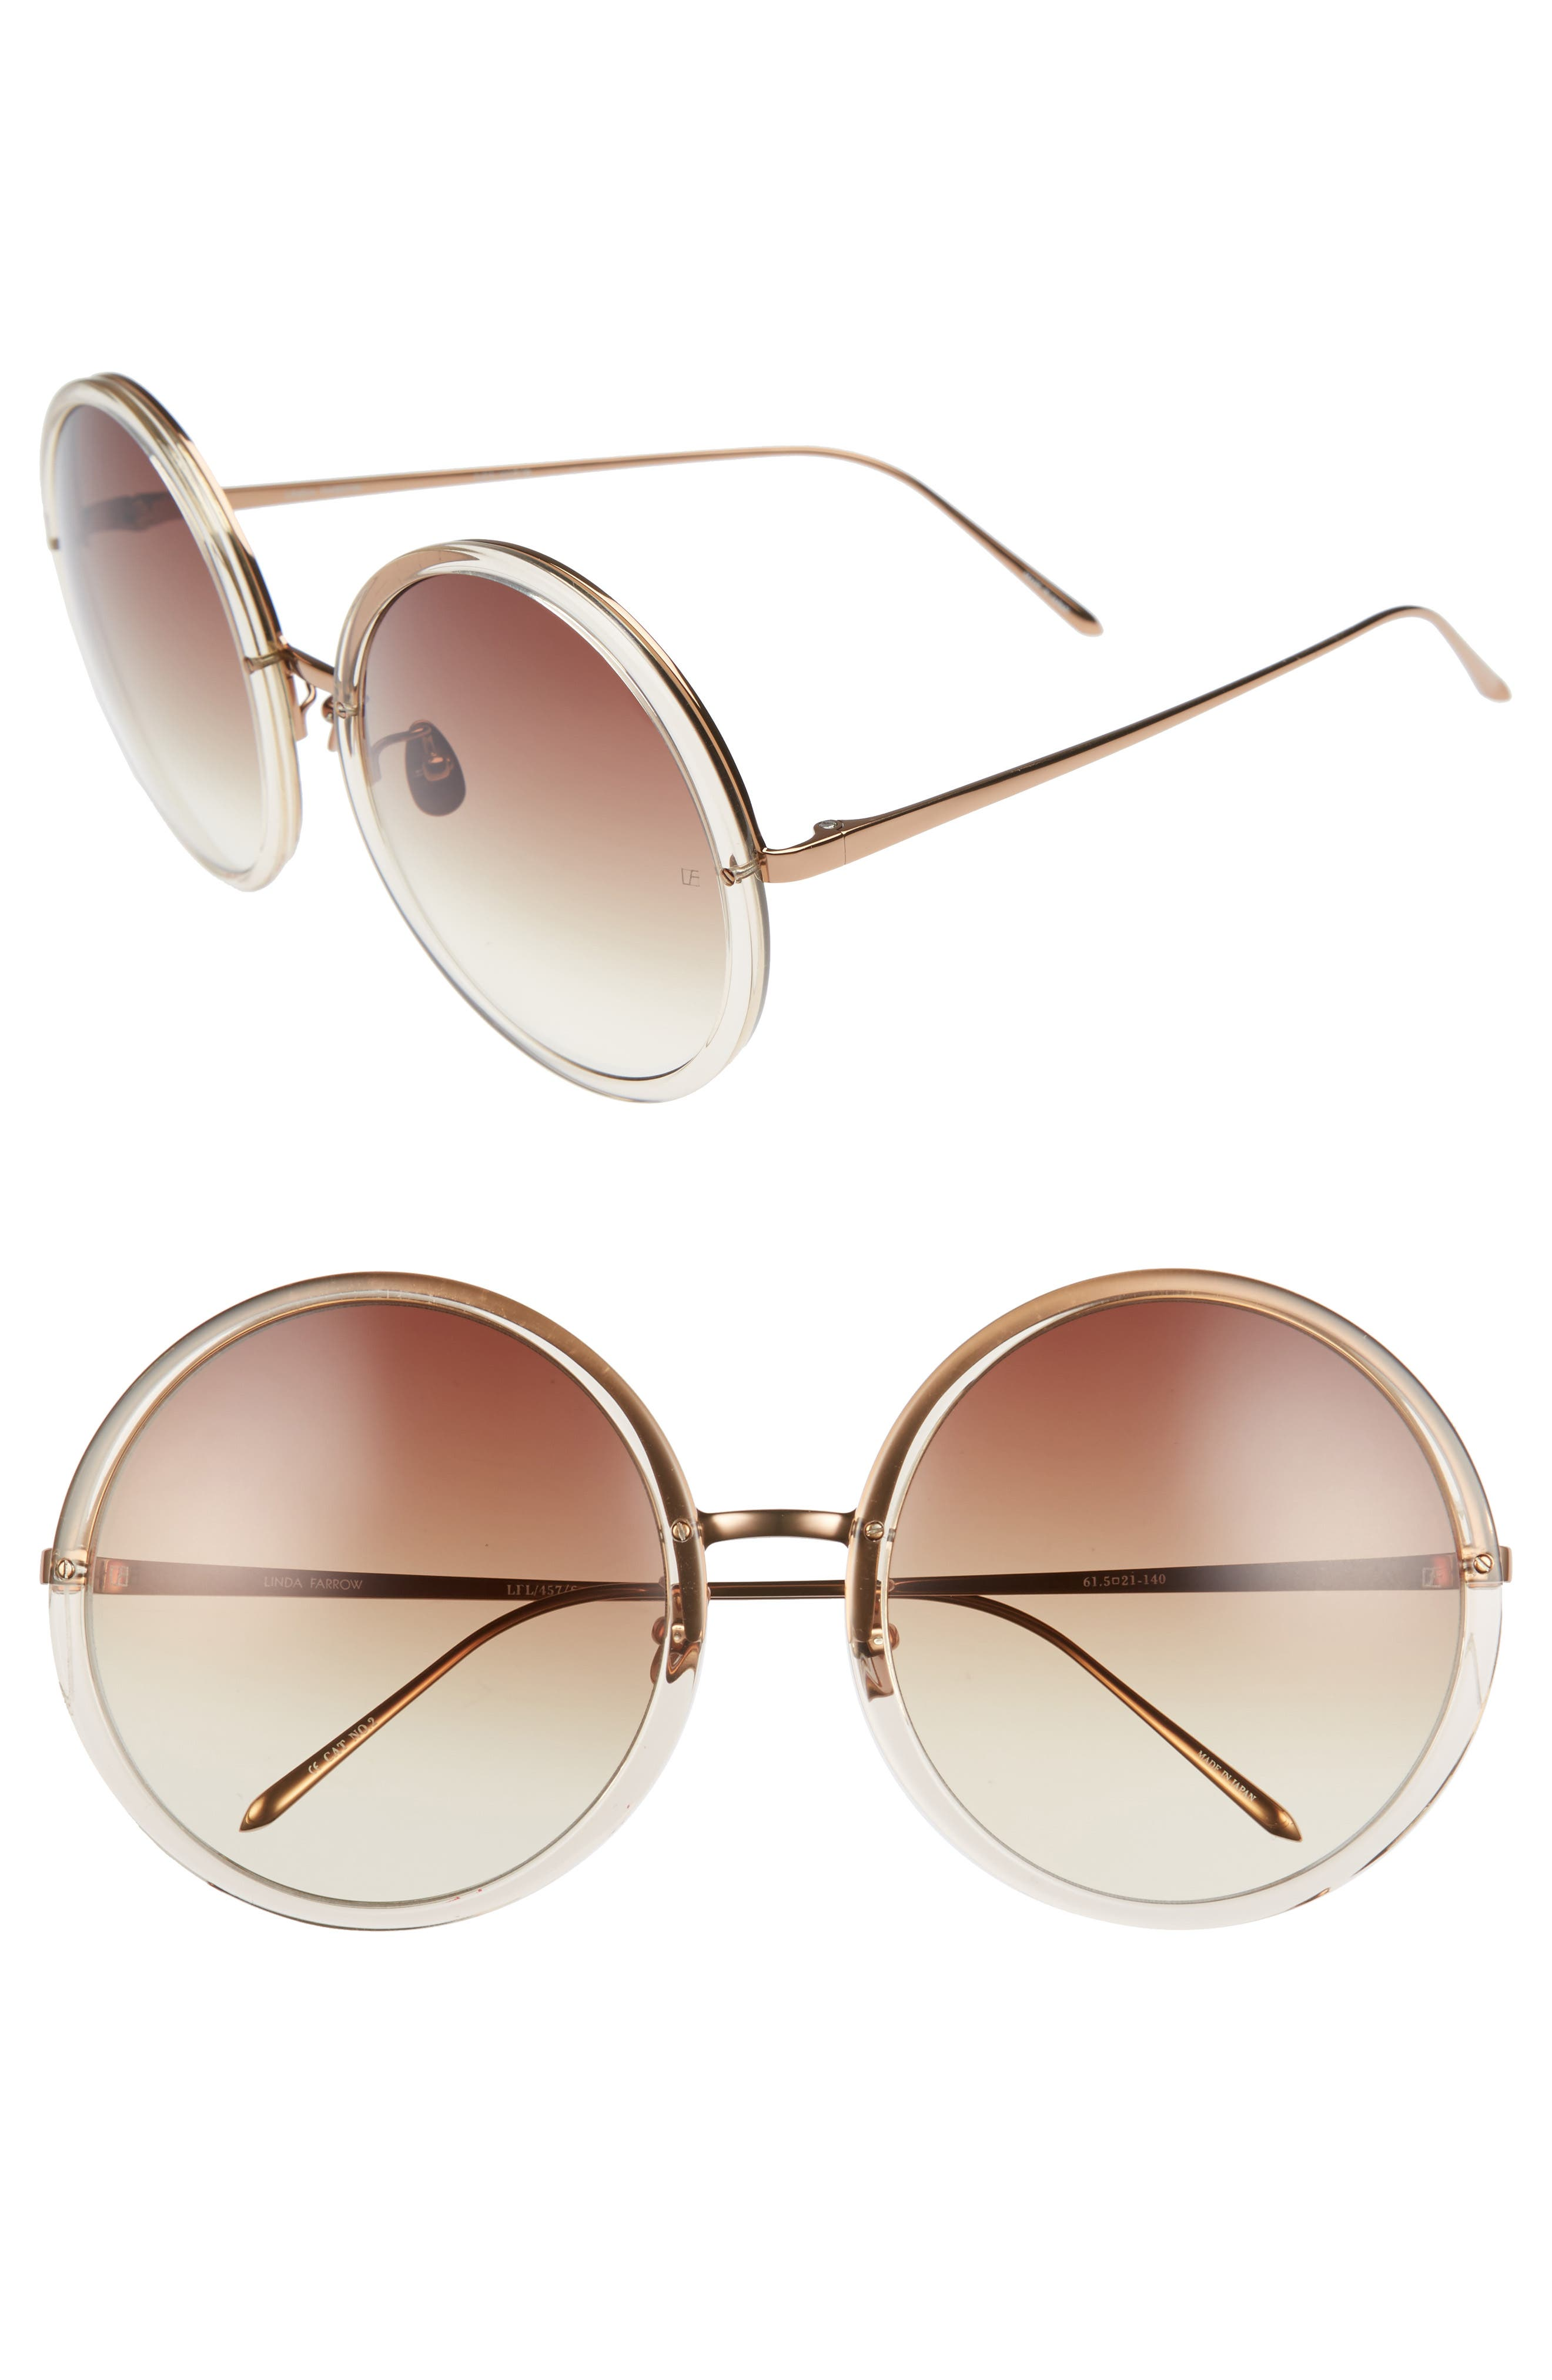 61mm Round 18 Karat Gold Trim Sunglasses,                             Main thumbnail 1, color,                             020